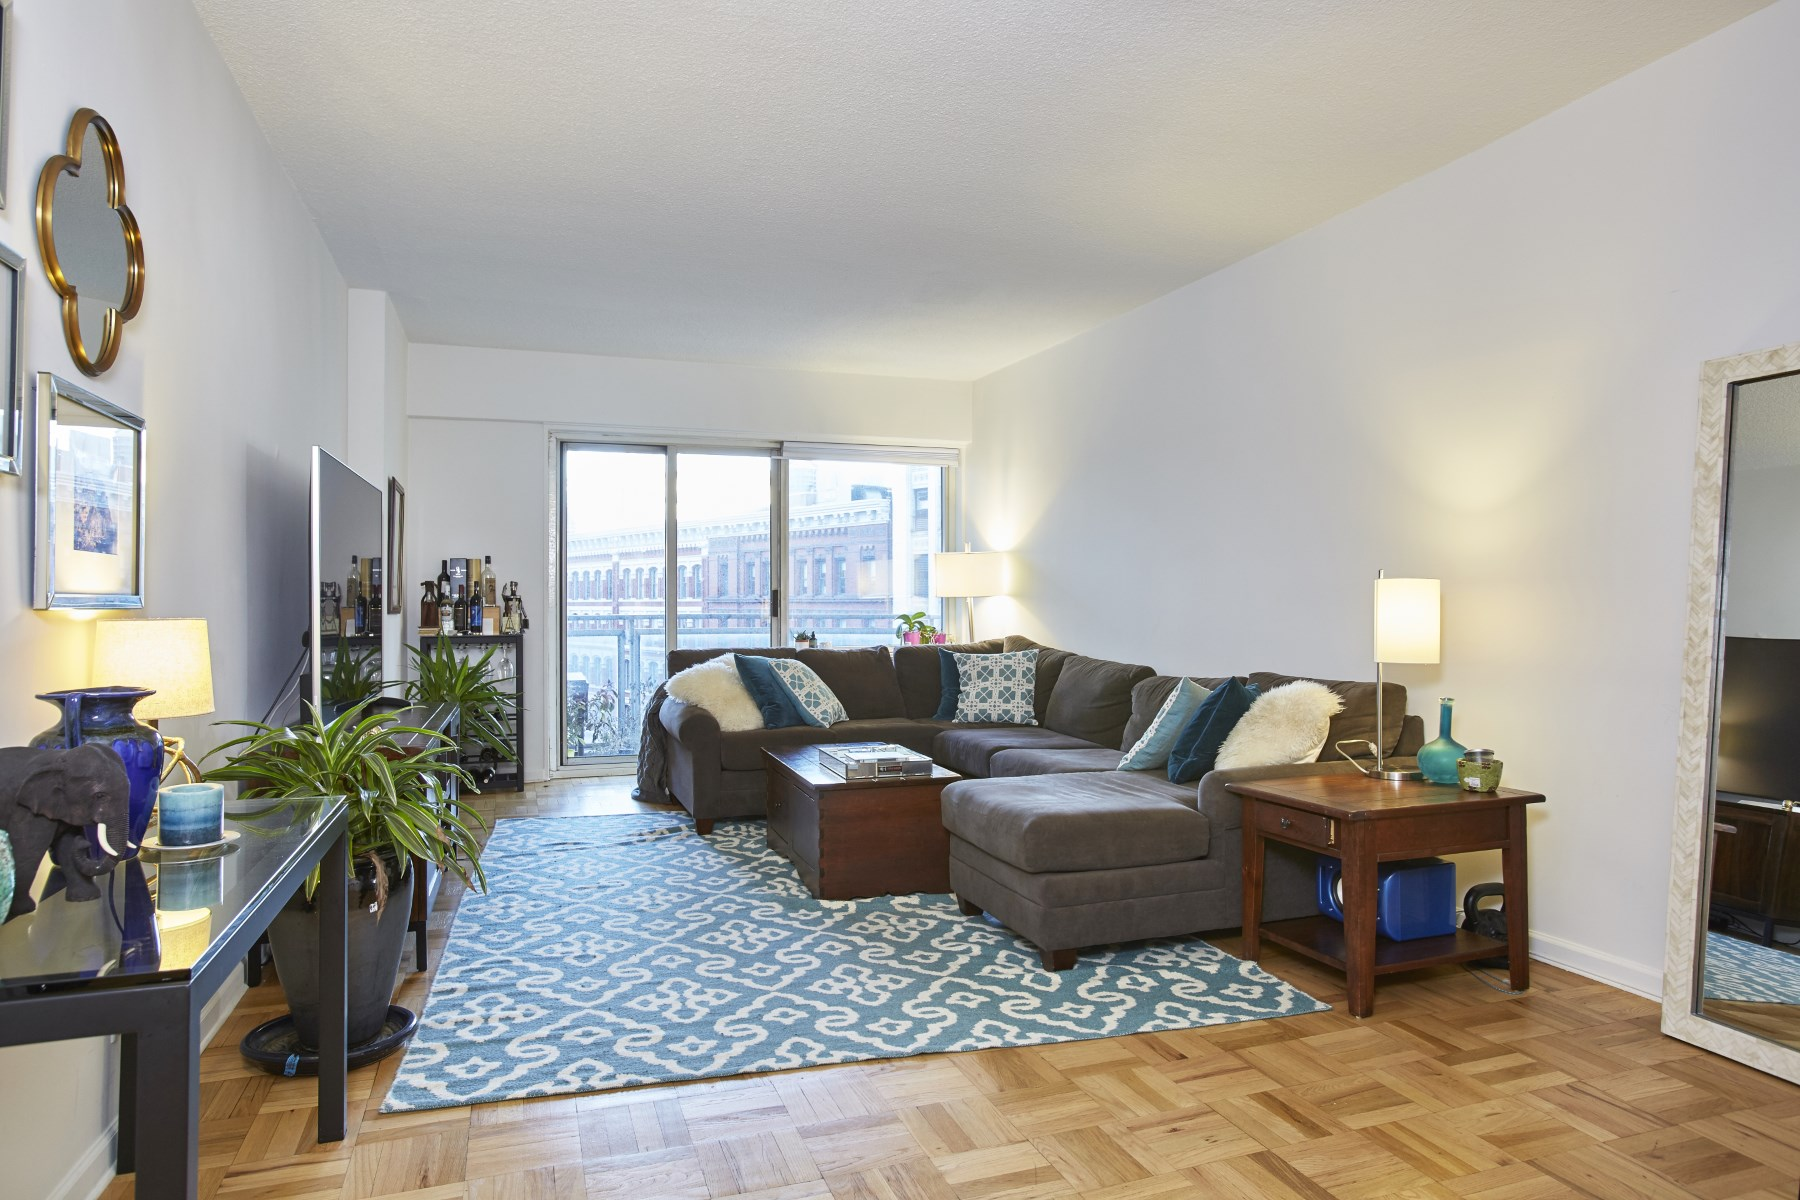 Appartement pour l Vente à 60 East 8th Street, Apt. 9M 60 East 8th Street Apt 9M Greenwich Village, New York, New York, 10003 États-Unis